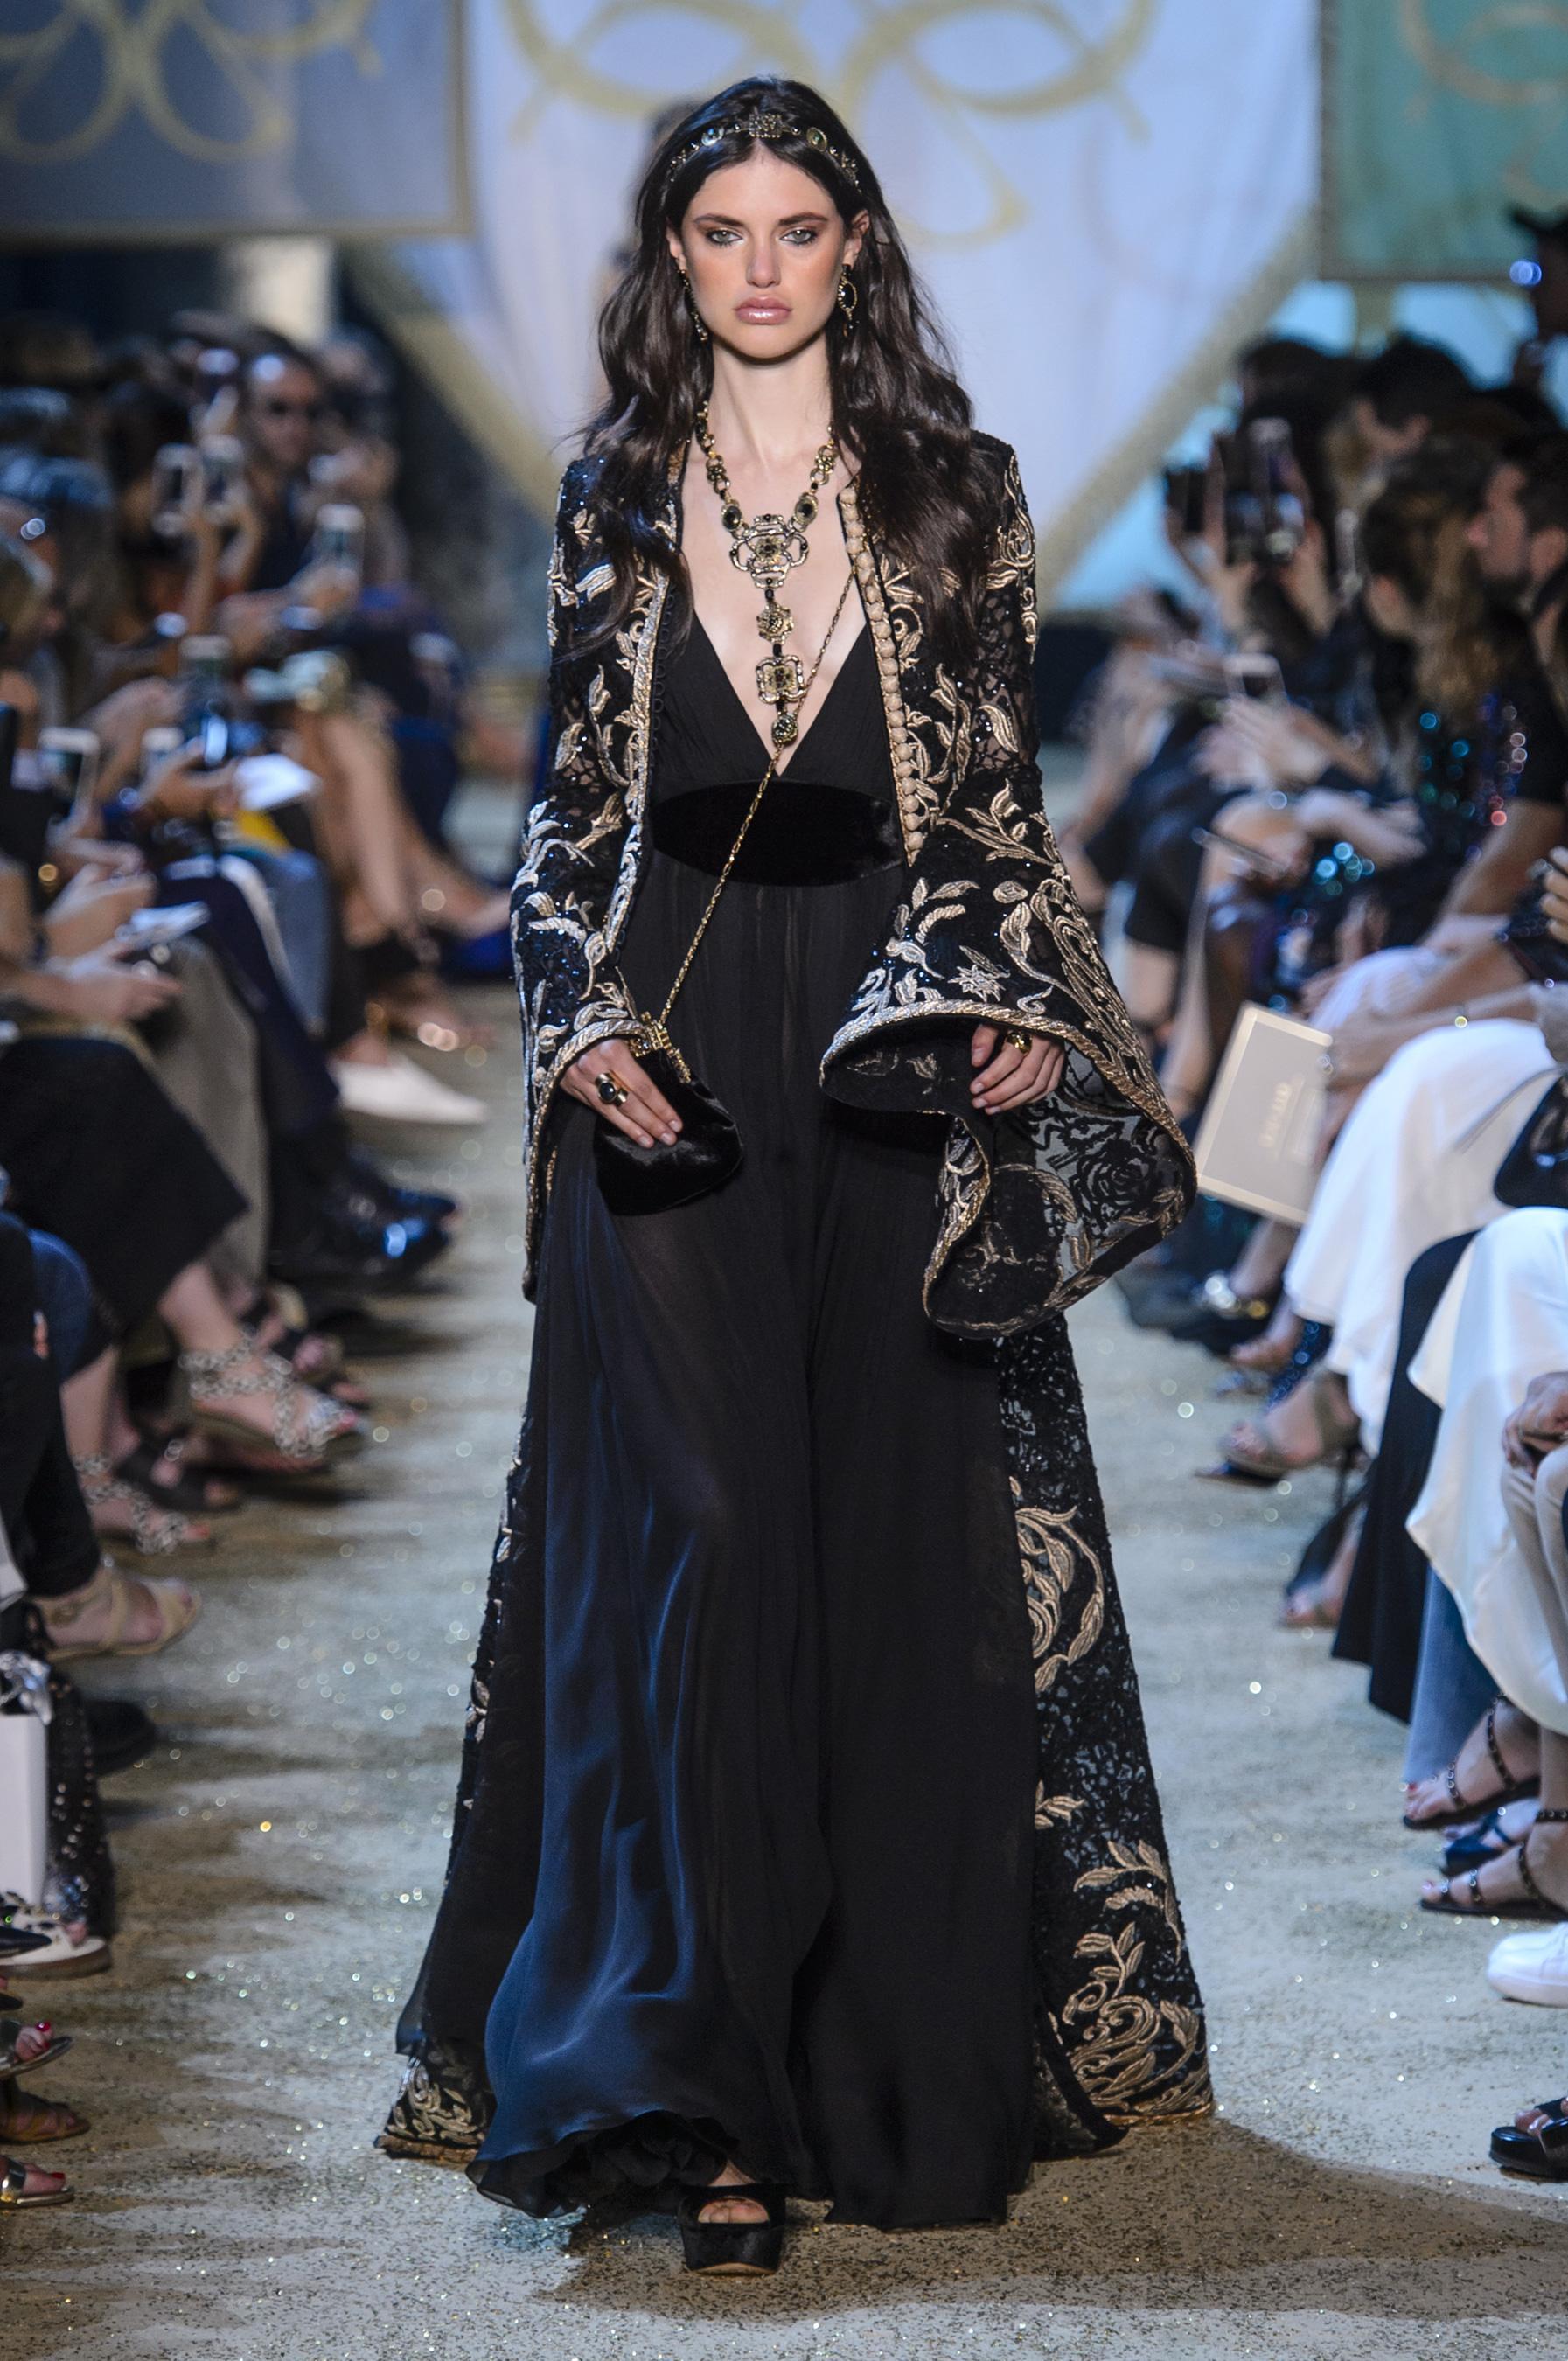 8c326feeb7a9e1 Défilé Elie Saab Automne-hiver 2017-2018 Couture - Madame Figaro